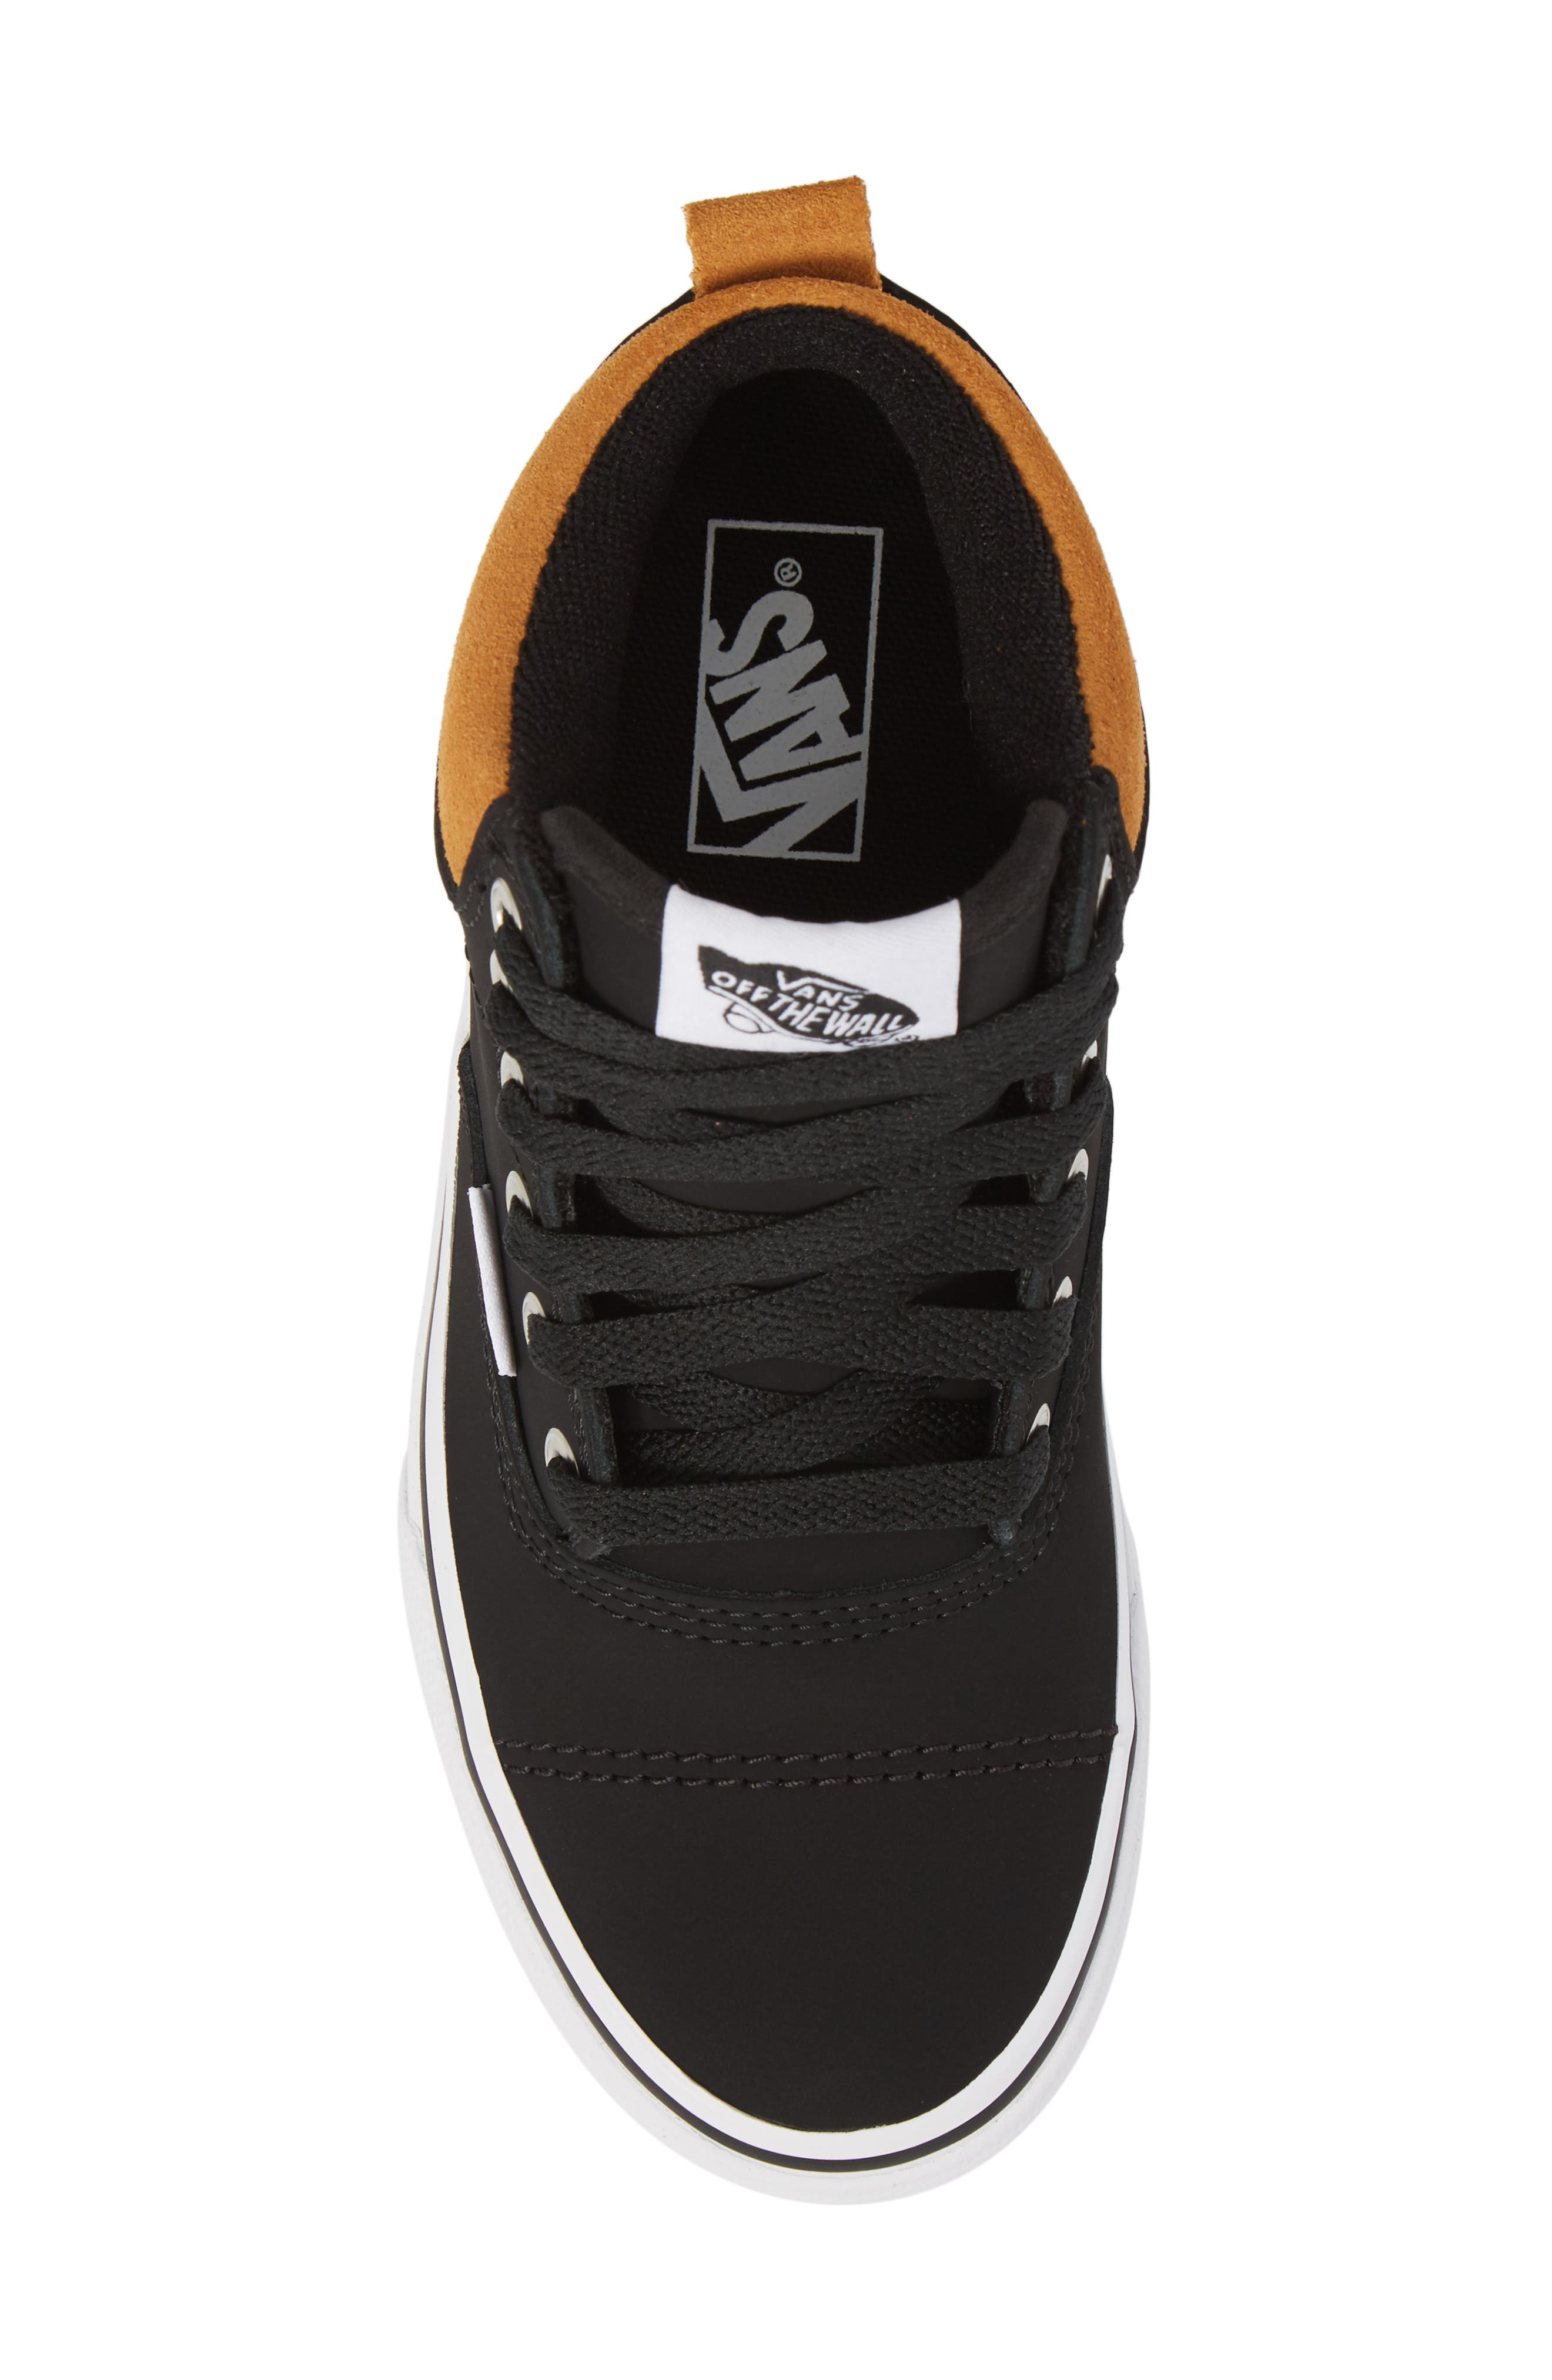 Era - Hi Sneaker,                             Alternate thumbnail 5, color,                             Vansbuck Black/ Cathay Spice